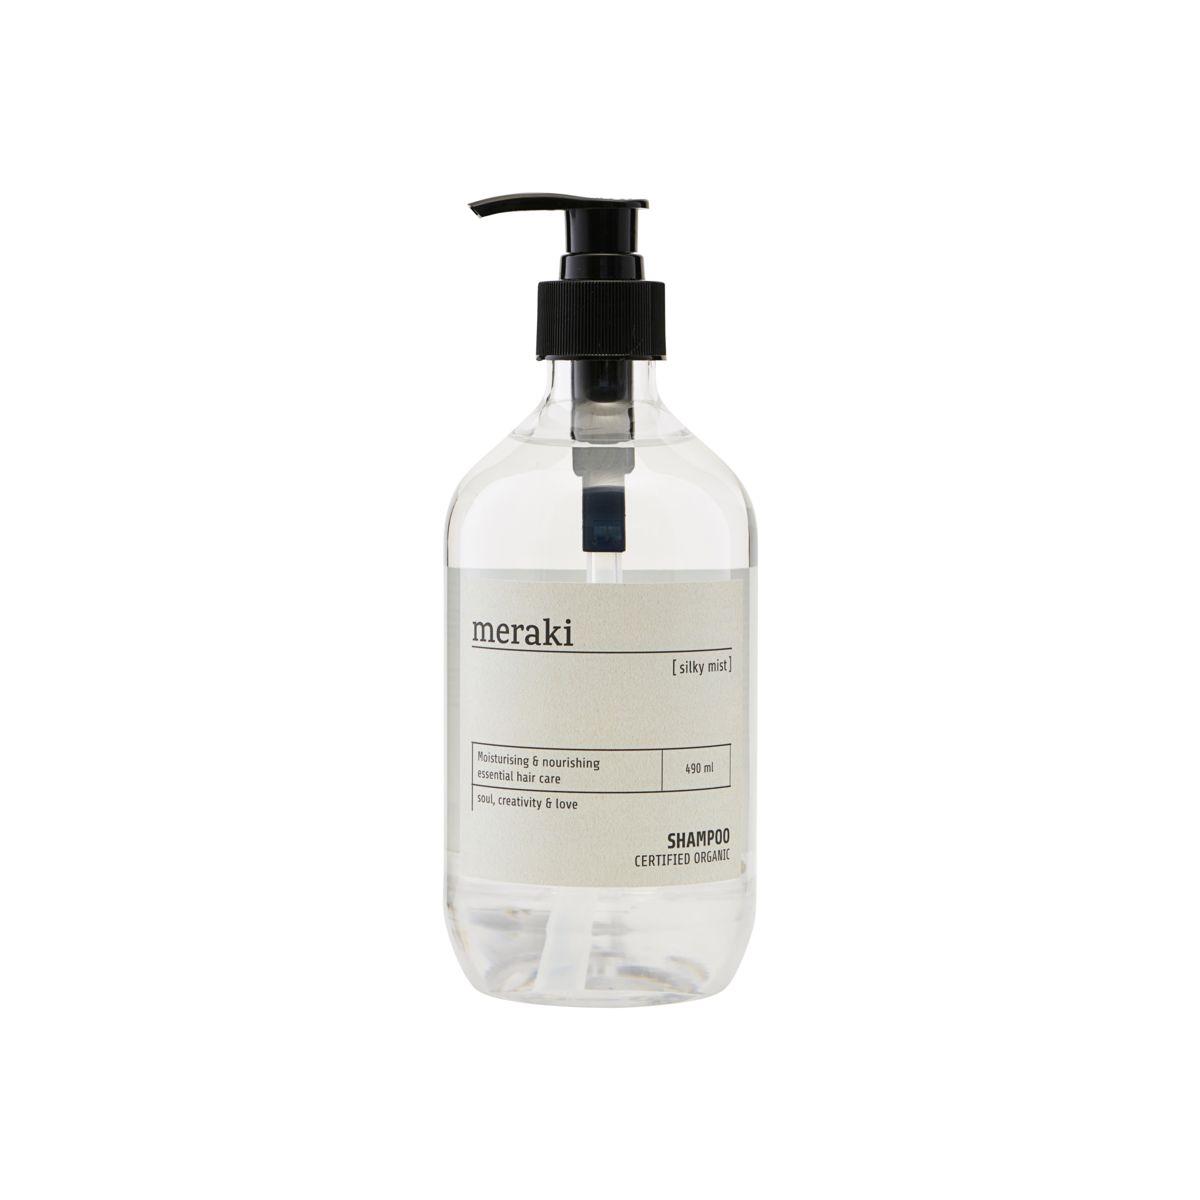 Meraki - Shampoo - Silky mist